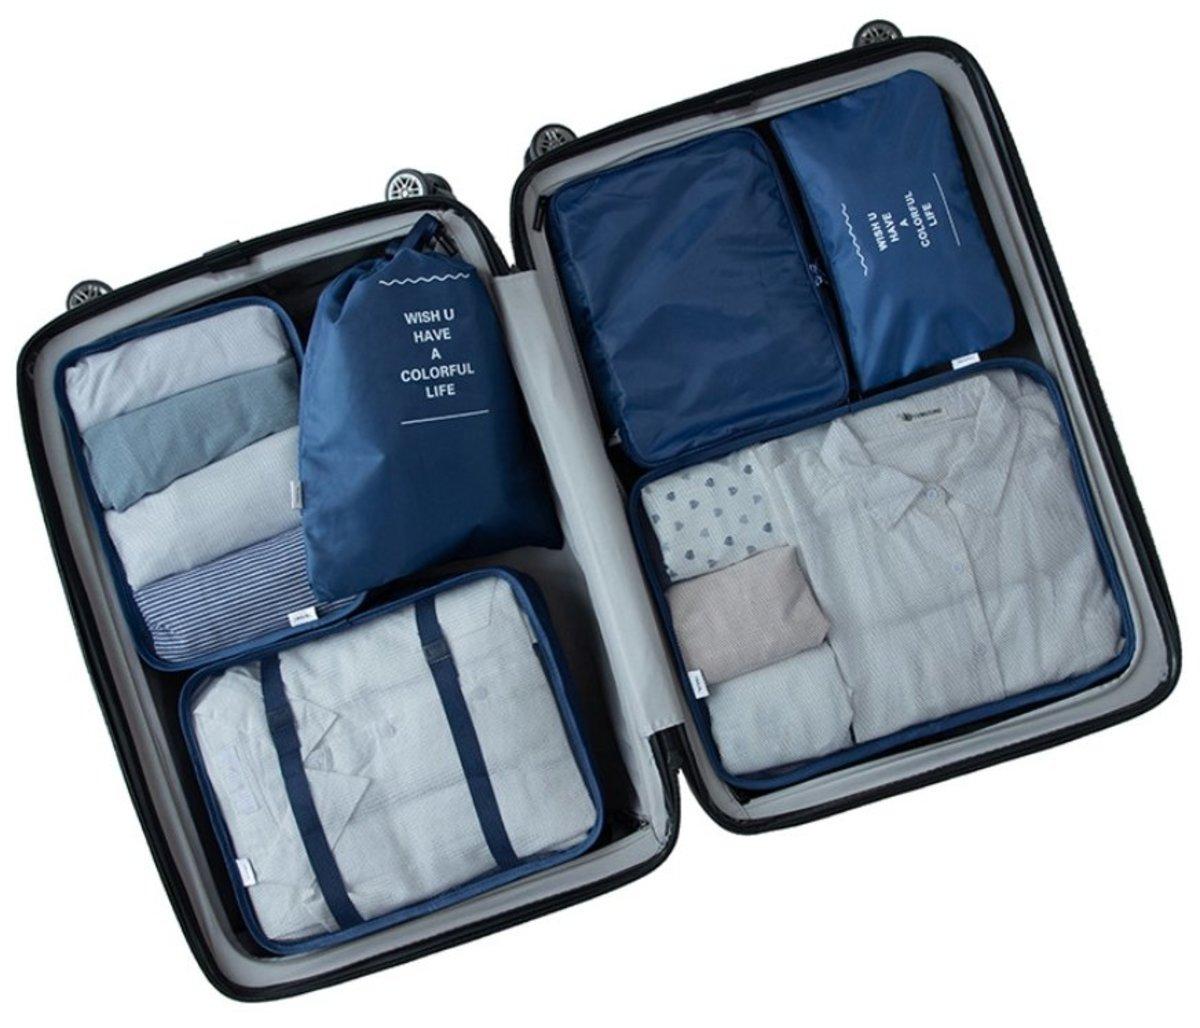 6pcs Travel Organizer Set Luggage Organizers (Navy Blue)